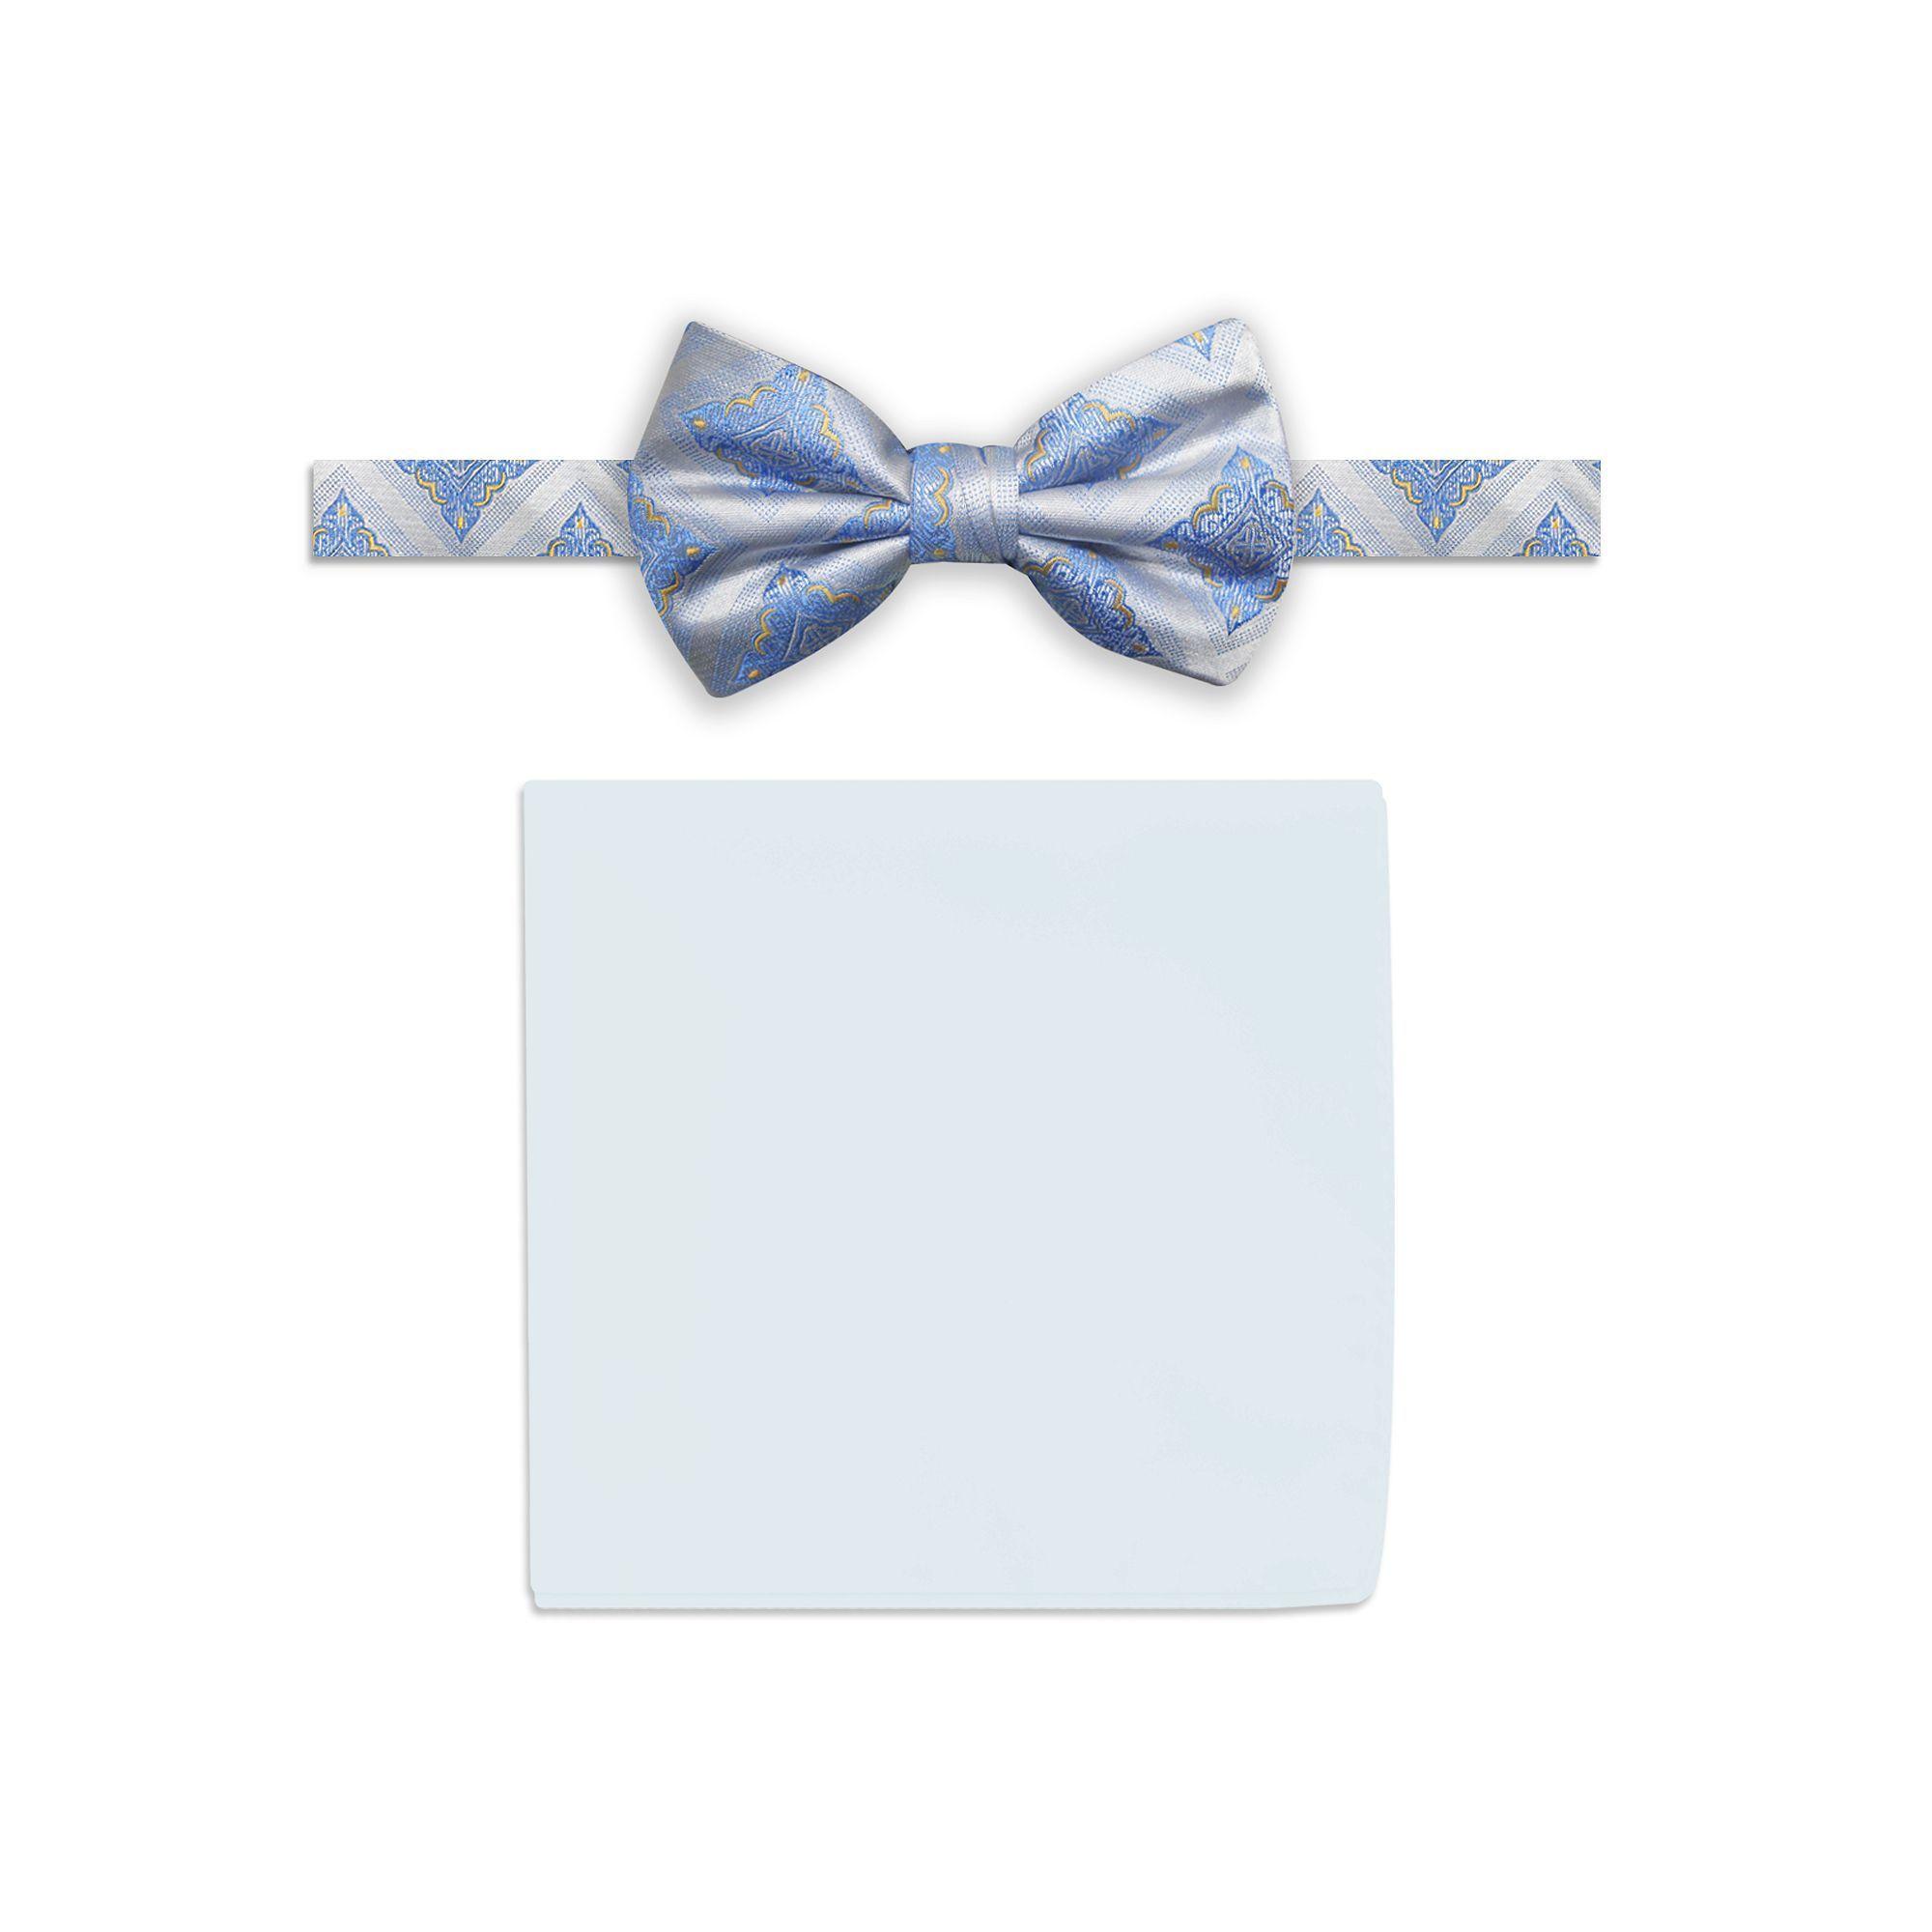 Men's Steve Harvey Medallion Pre-Tied Bow Tie & Solid Pocket Square, White